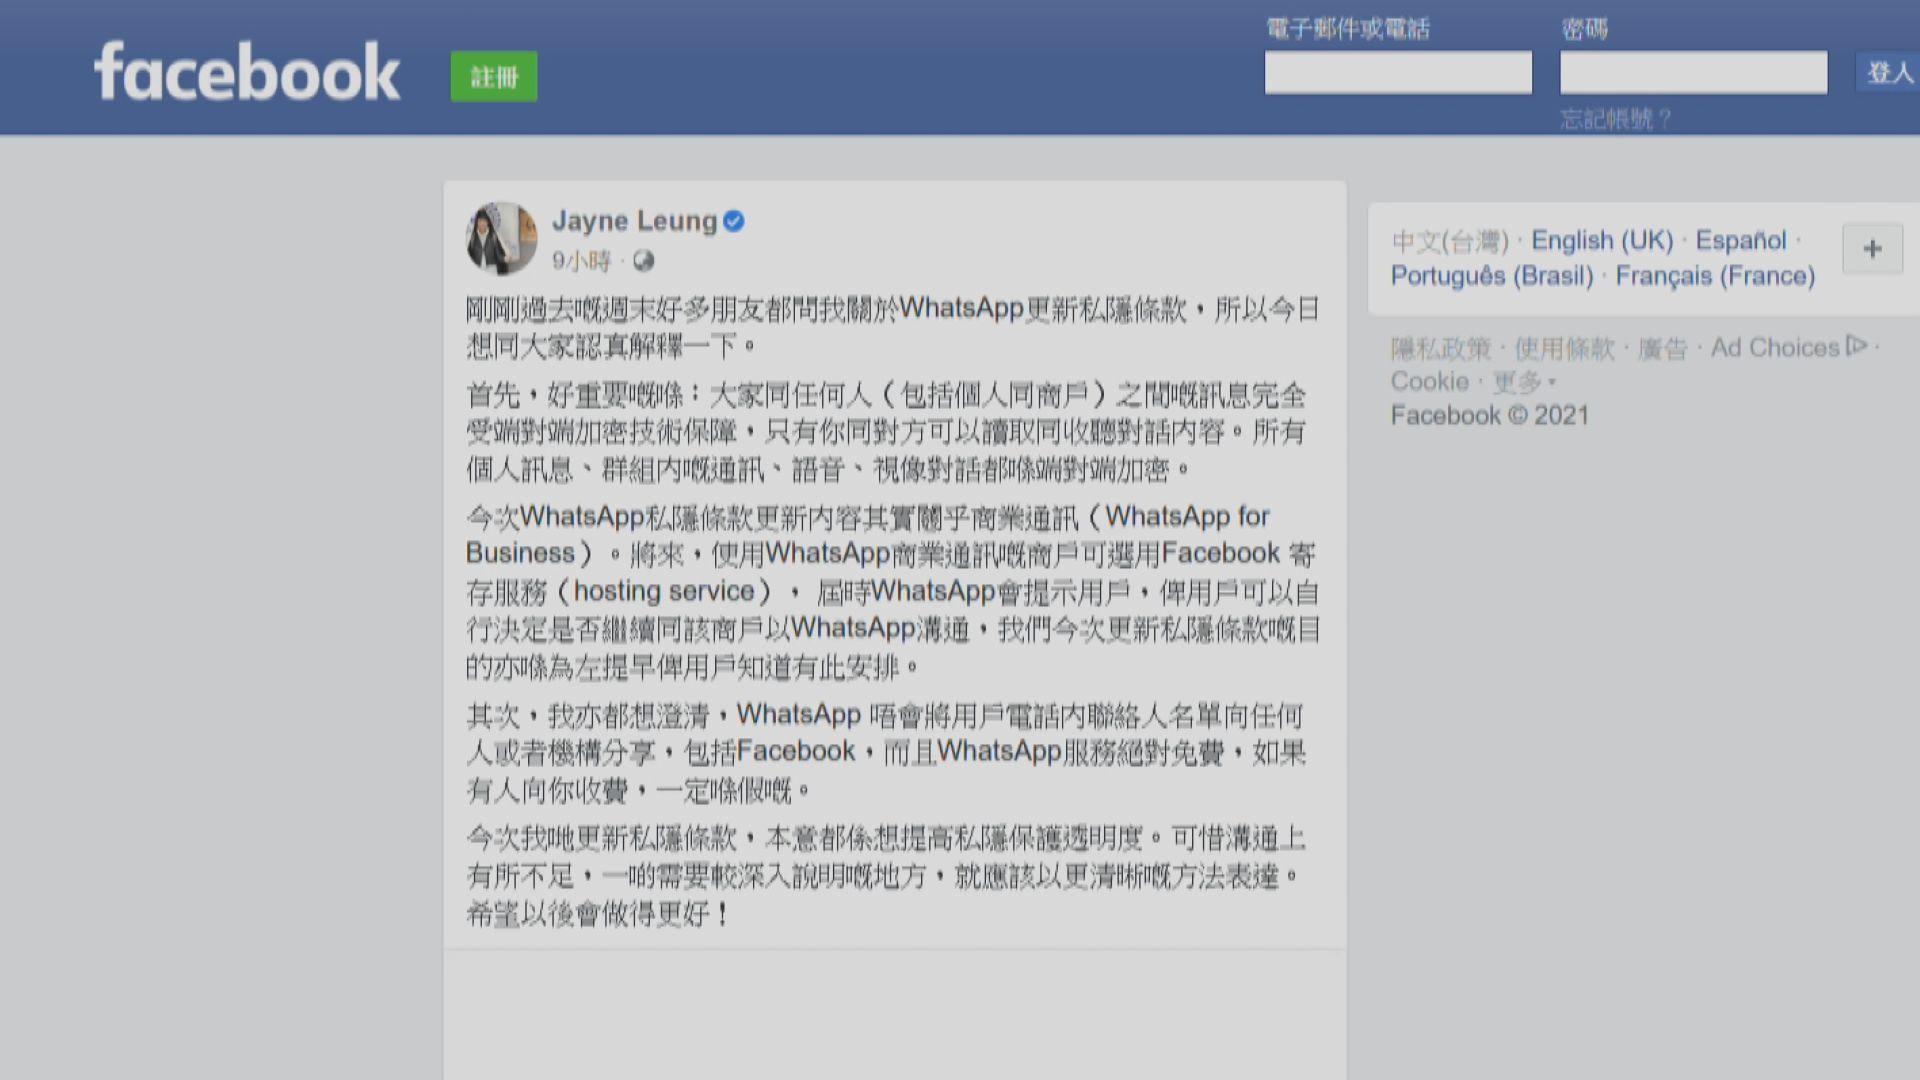 Facebook大中華區總裁:WhatsApp對話仍受加密保障